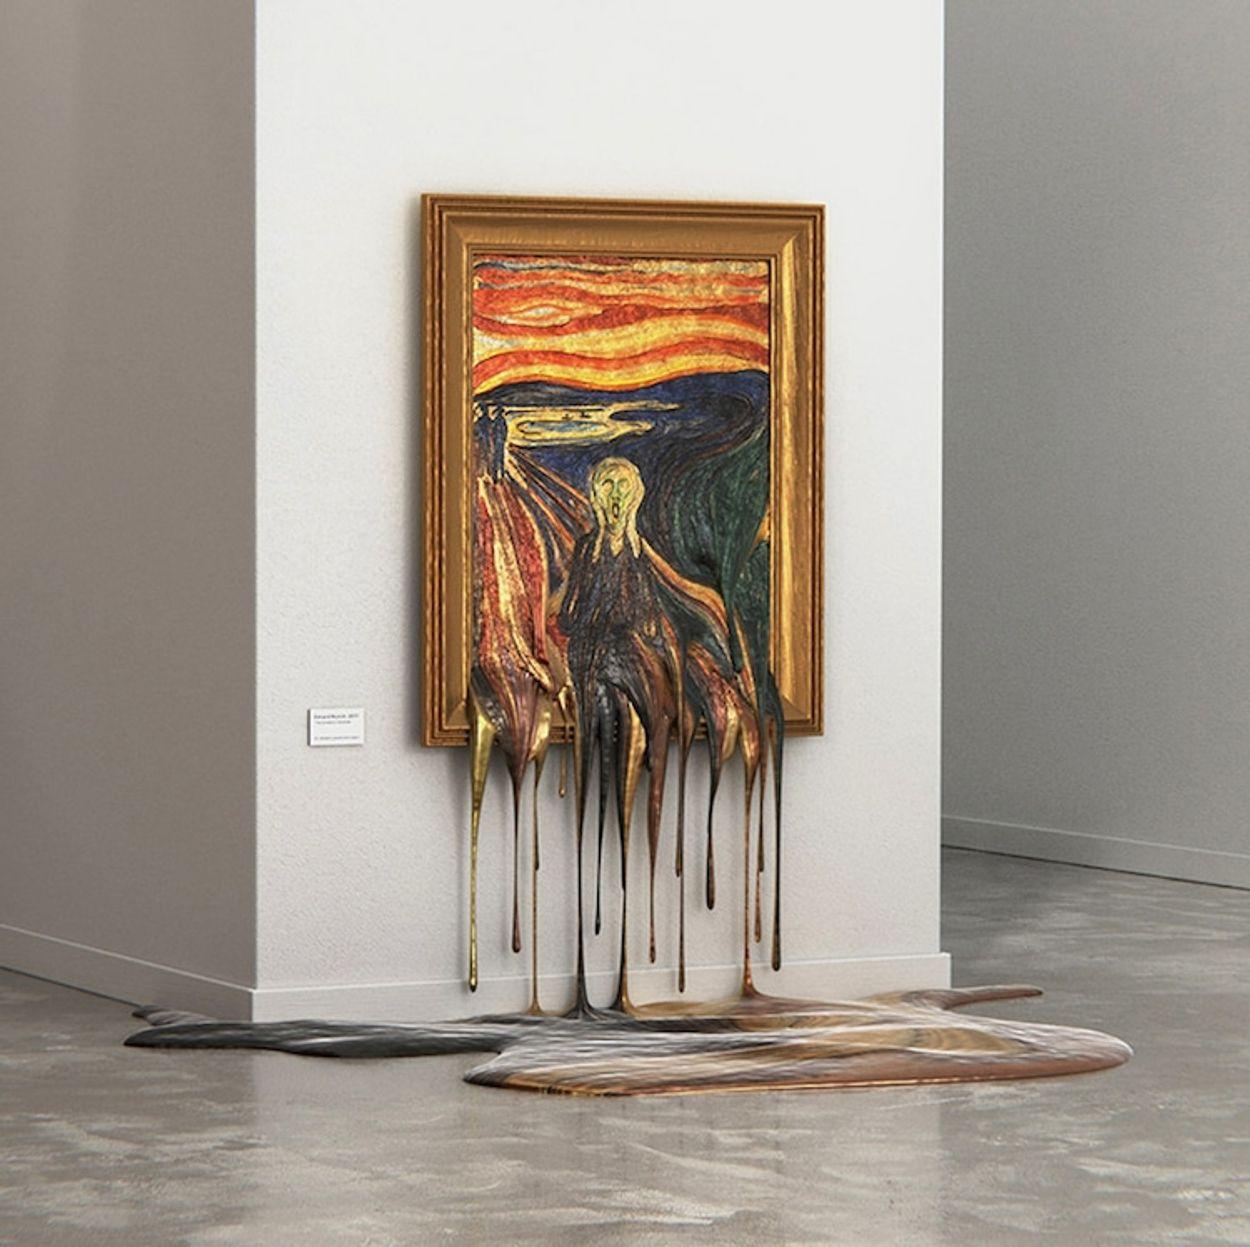 melting-masterpieces-digital-art-alper-dostal-2